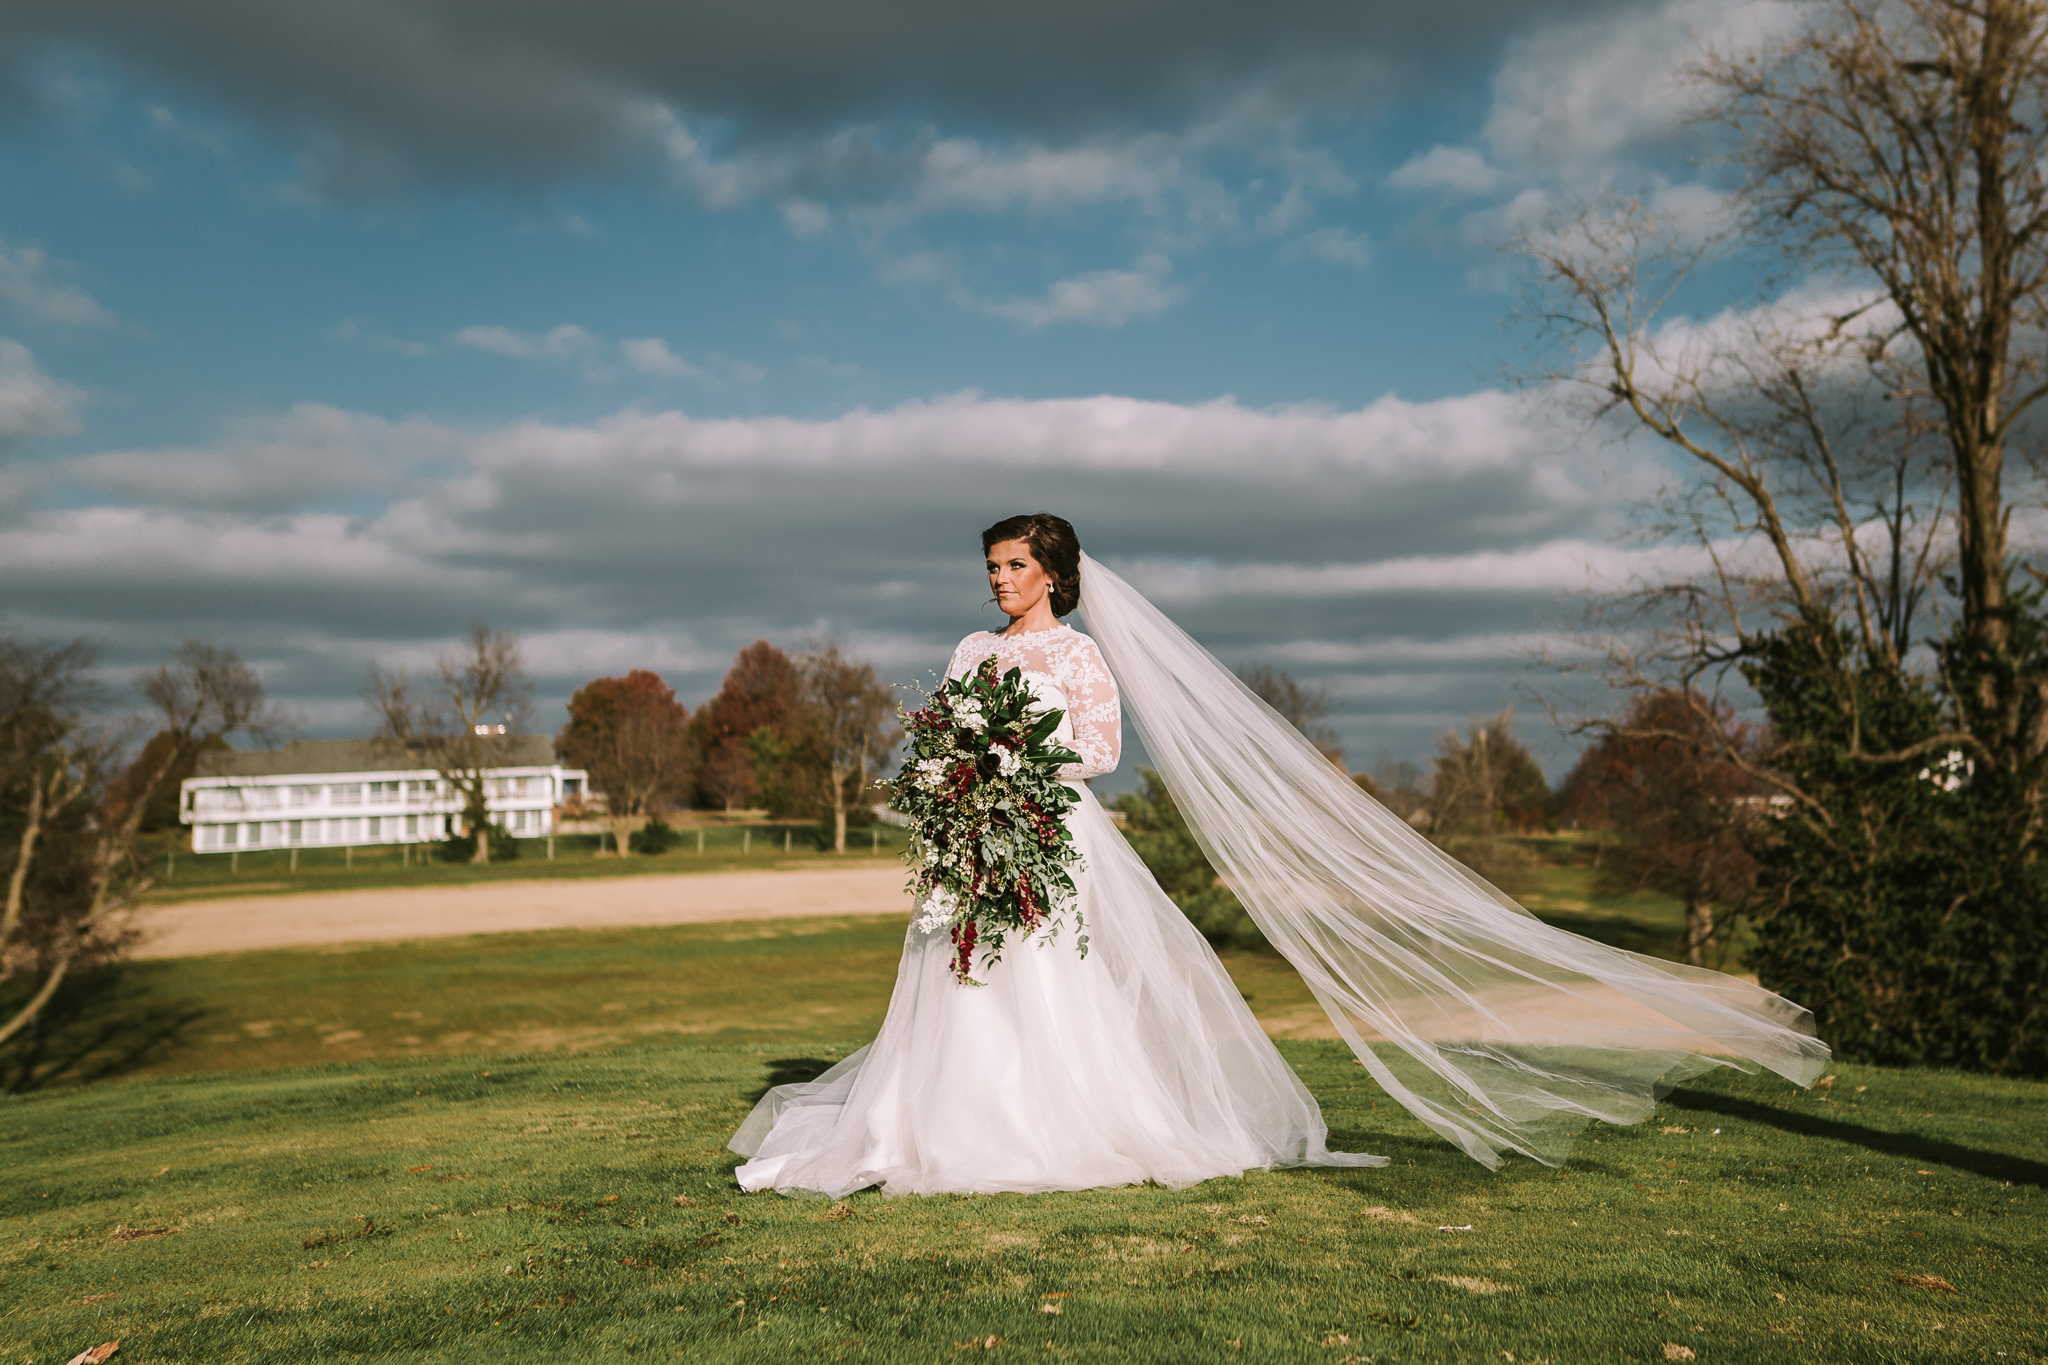 Richmond Kentucky Wedding Photographer - Ariana Jordan Photography -22.jpg